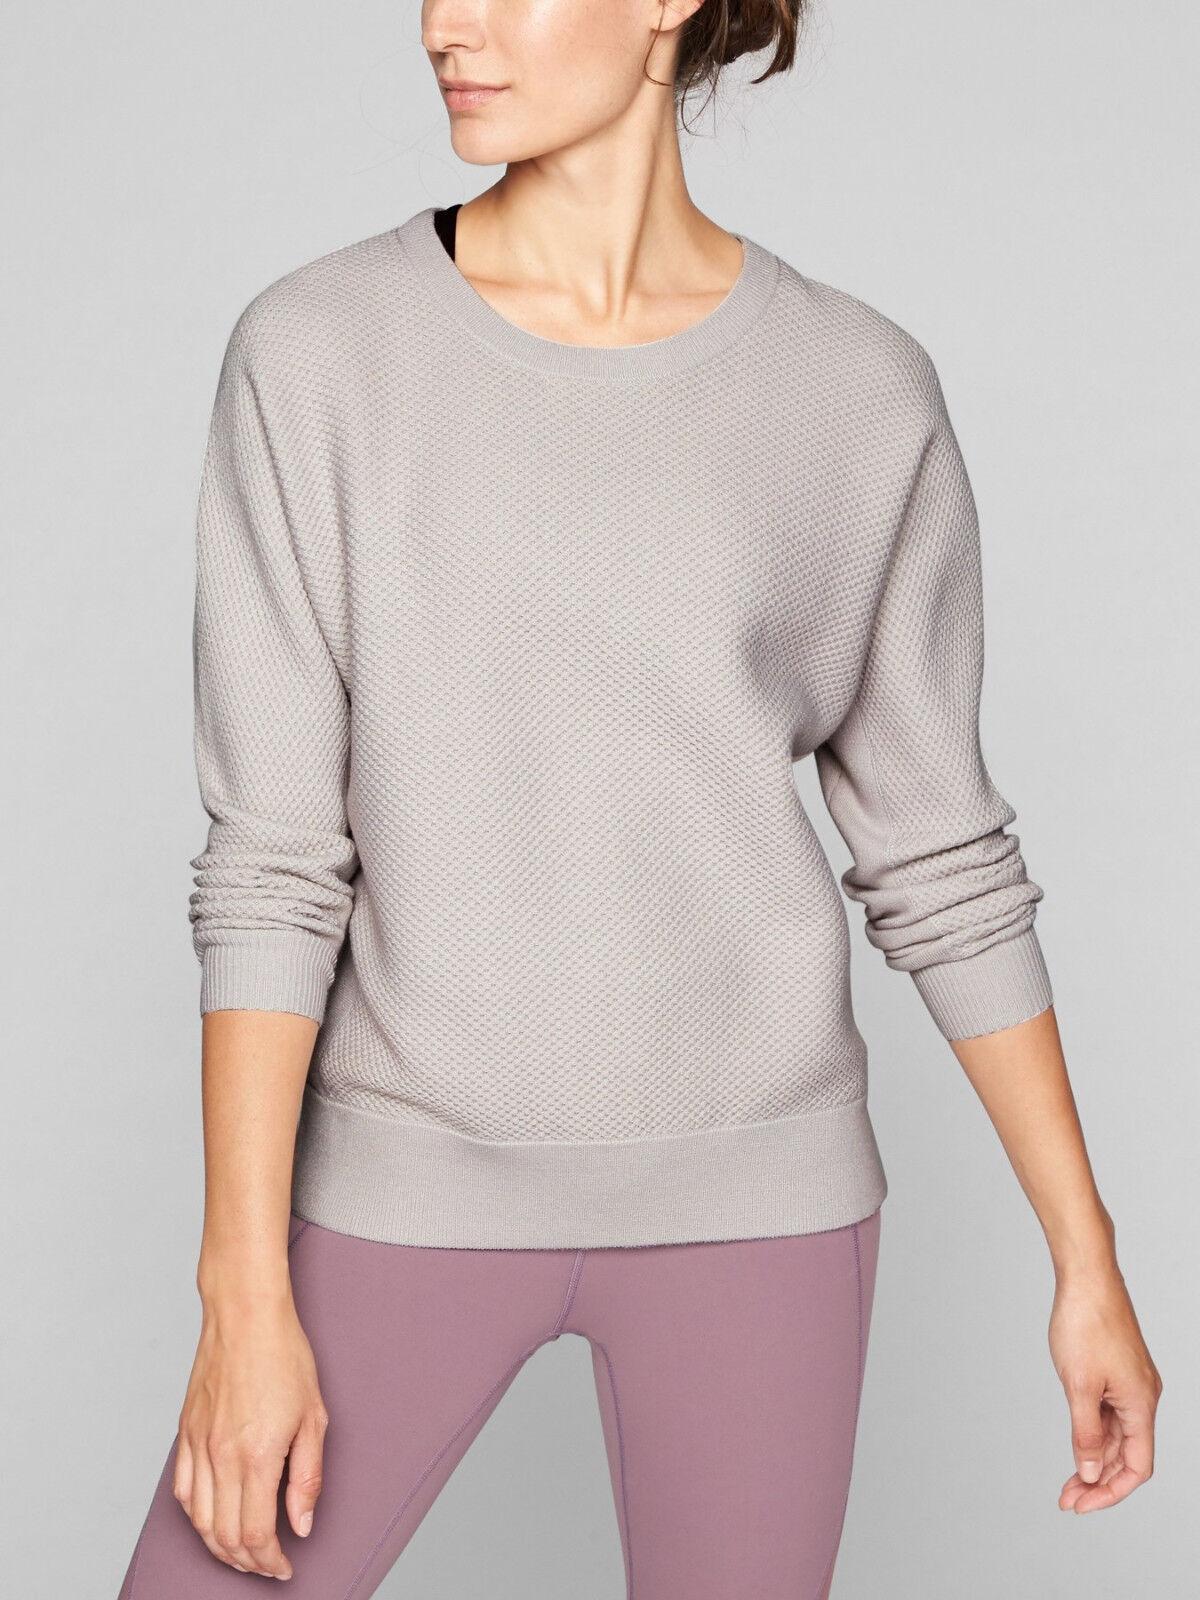 ATHLETA Thermal Honeycomb Dolman Sweater, NWOT Medium, Light Grey Washable Wool